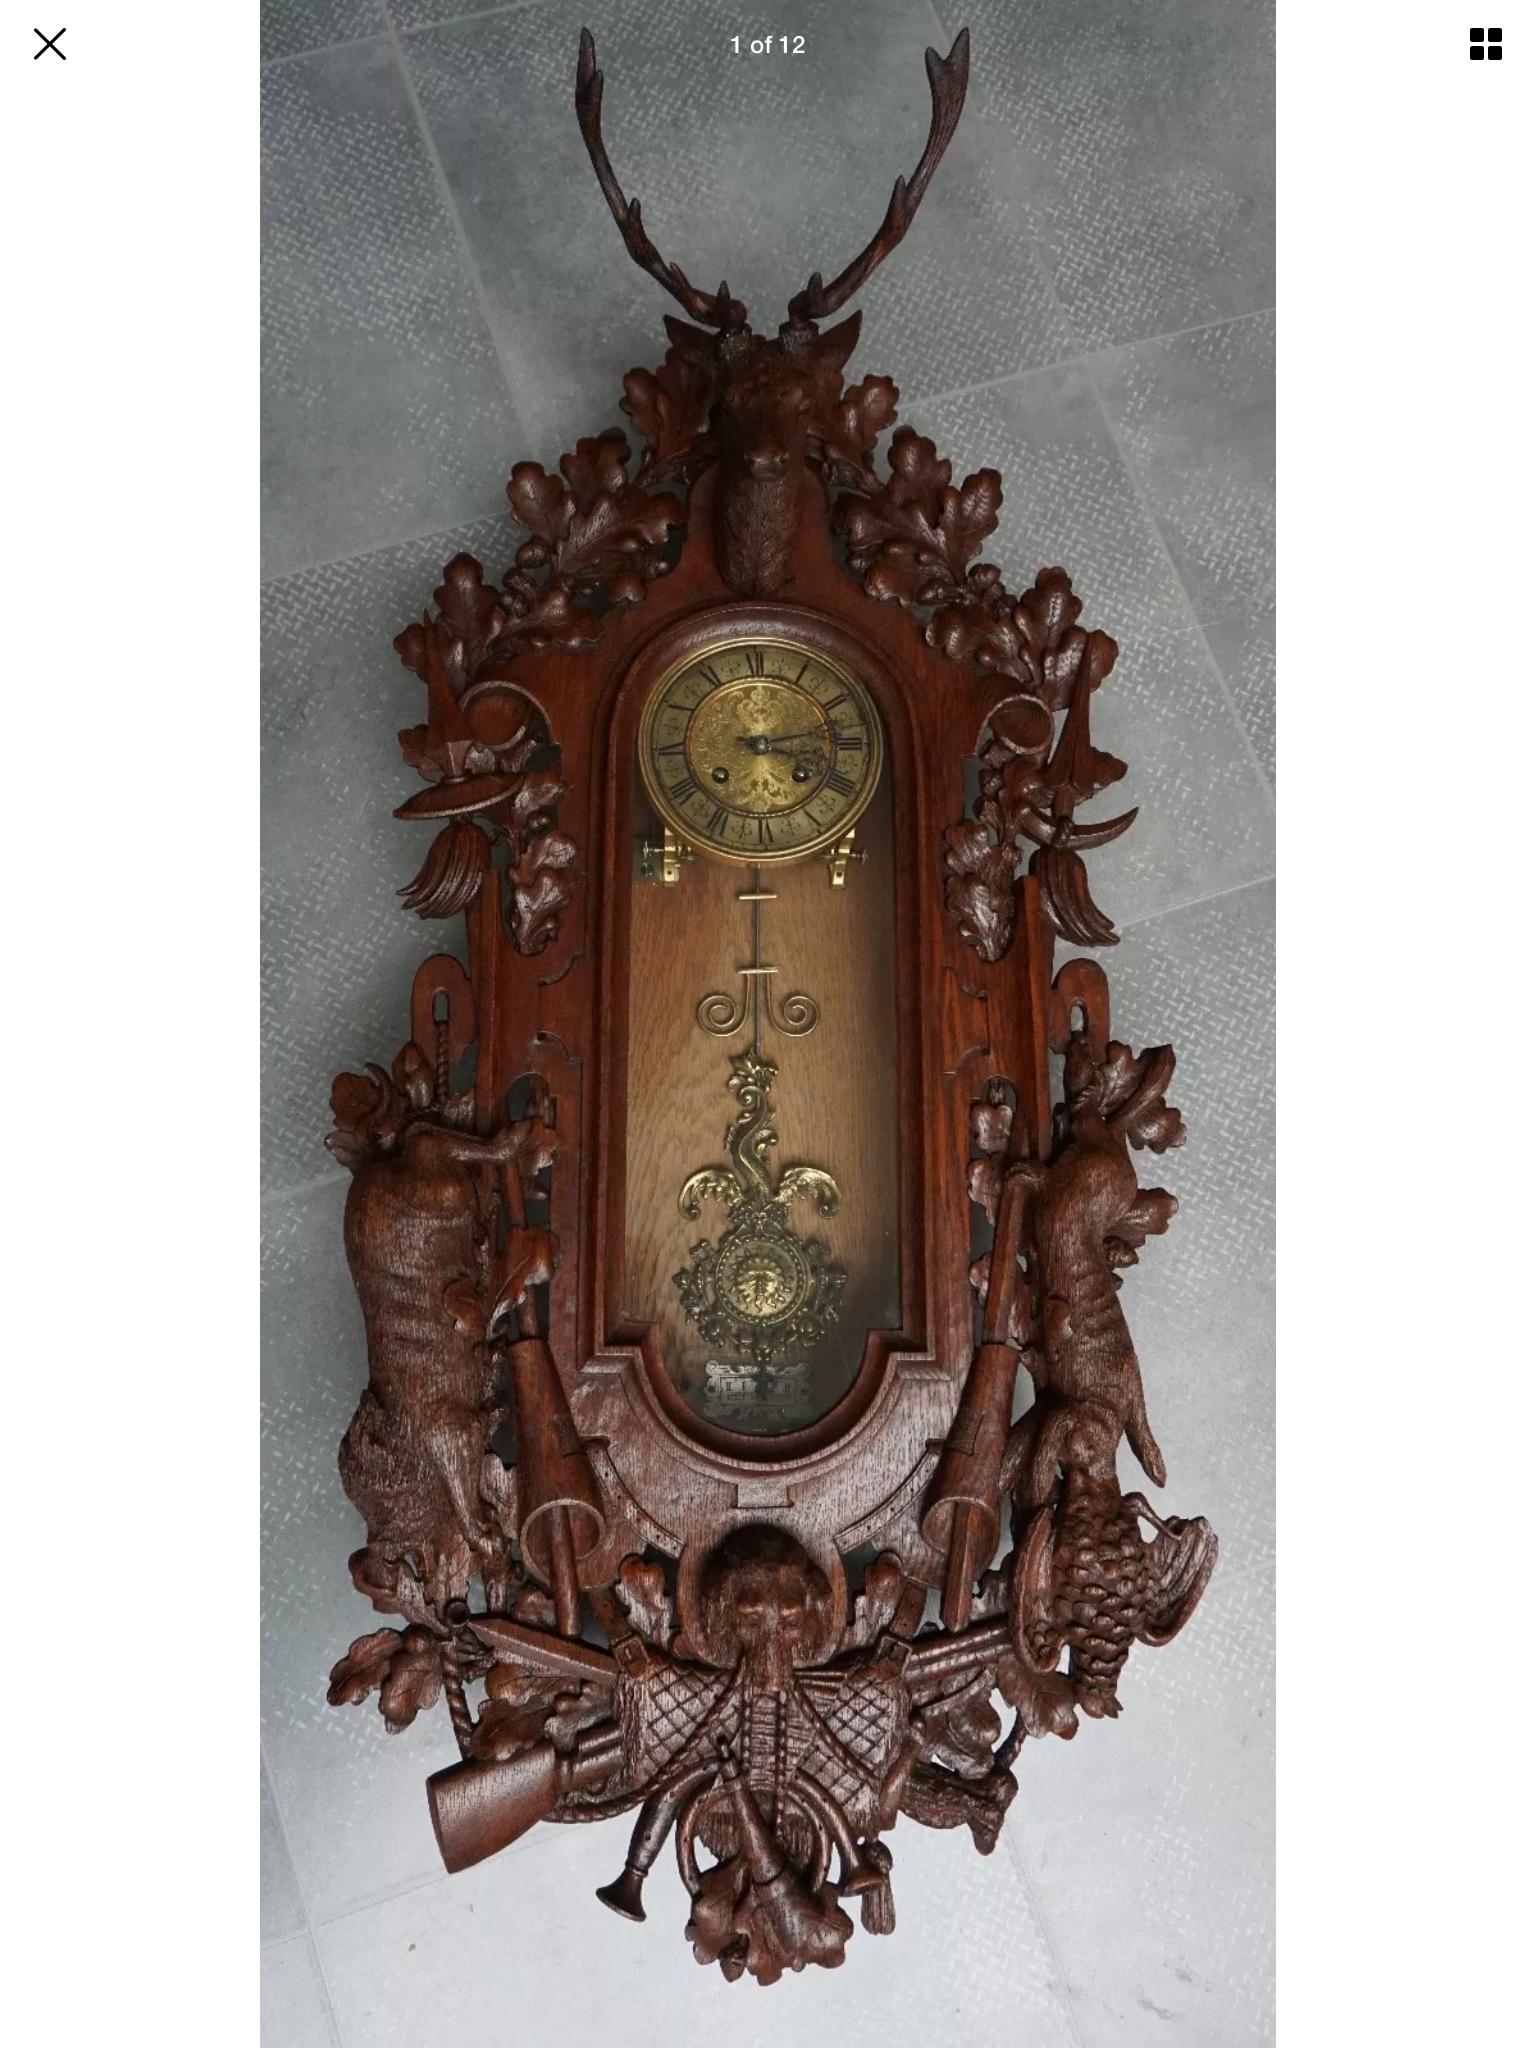 Pin By David Wilson On Vienna Regulators Antique Wall Clock Luxury Clock Clock